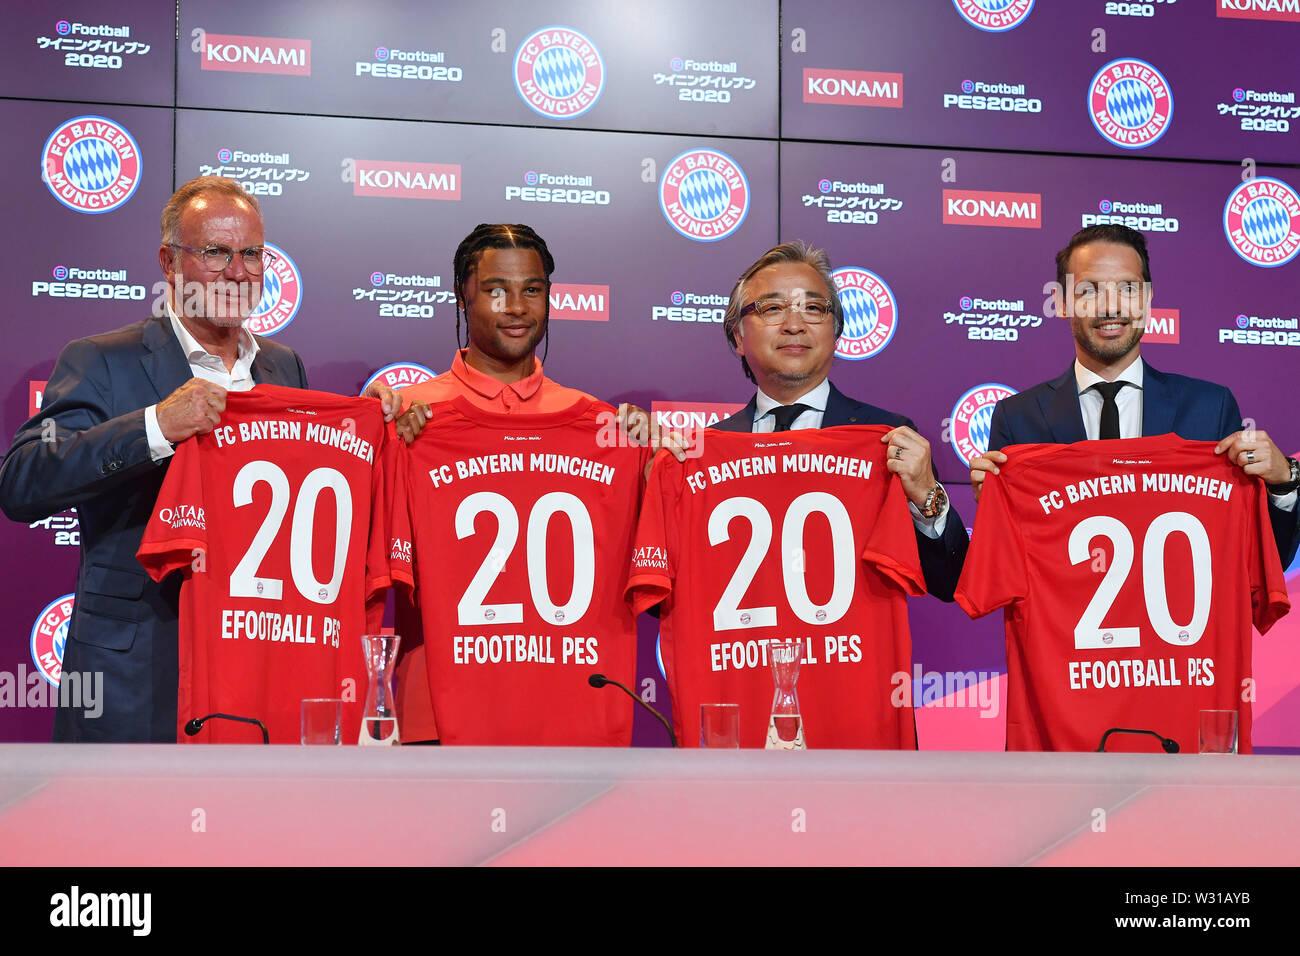 Pro Evolution Soccer Stock Photos & Pro Evolution Soccer